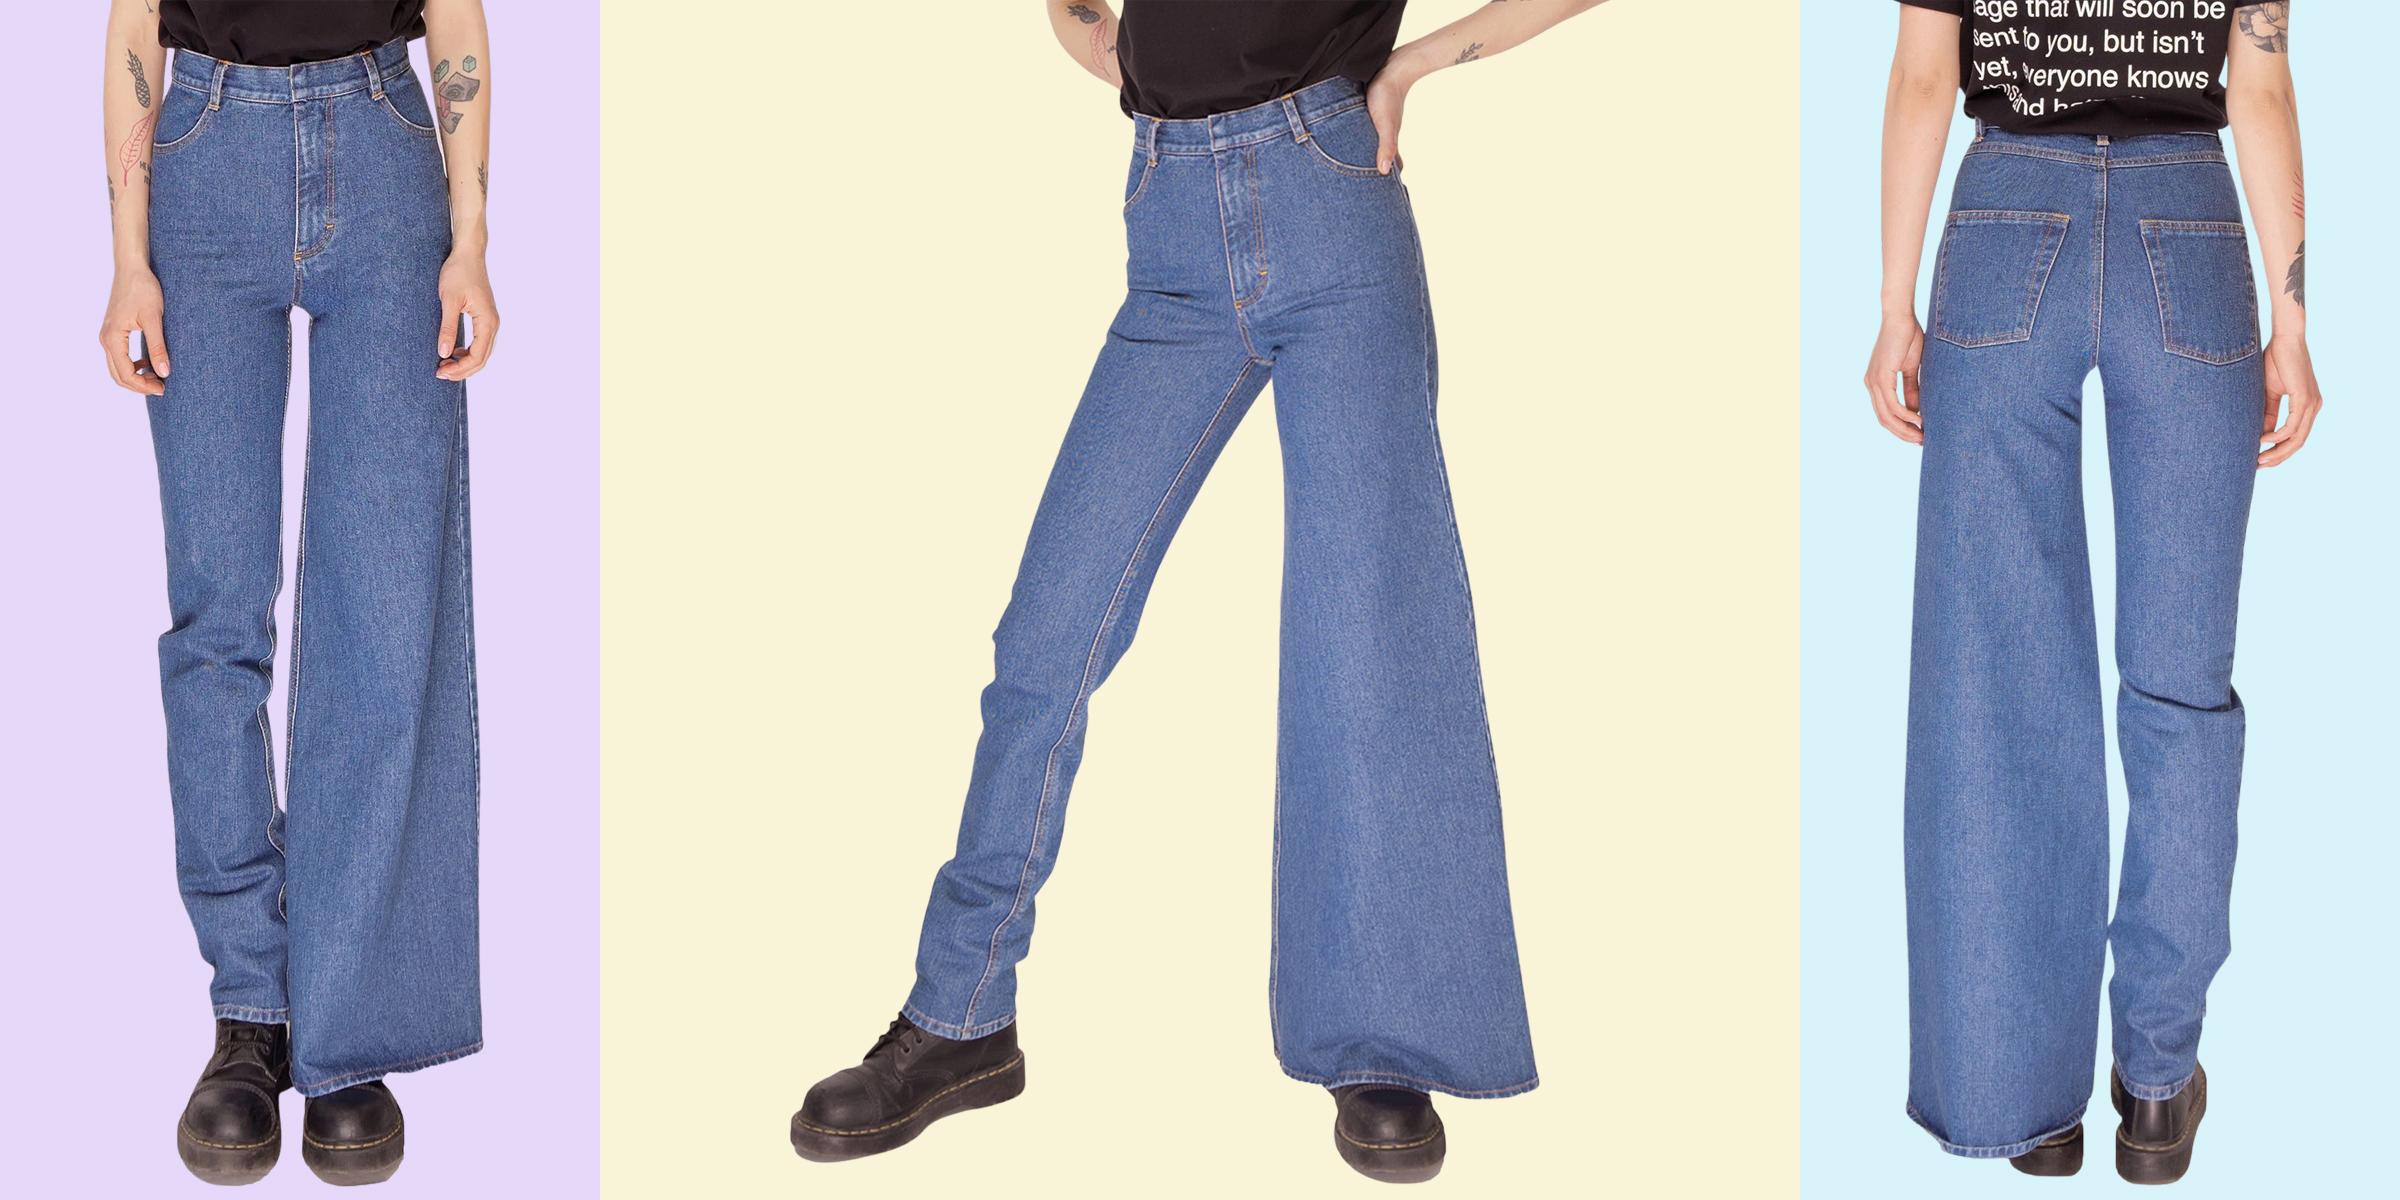 asymmetrical-jeans-today-main-190906_3ec636b558bcb7473580285c0984bc19.jpg